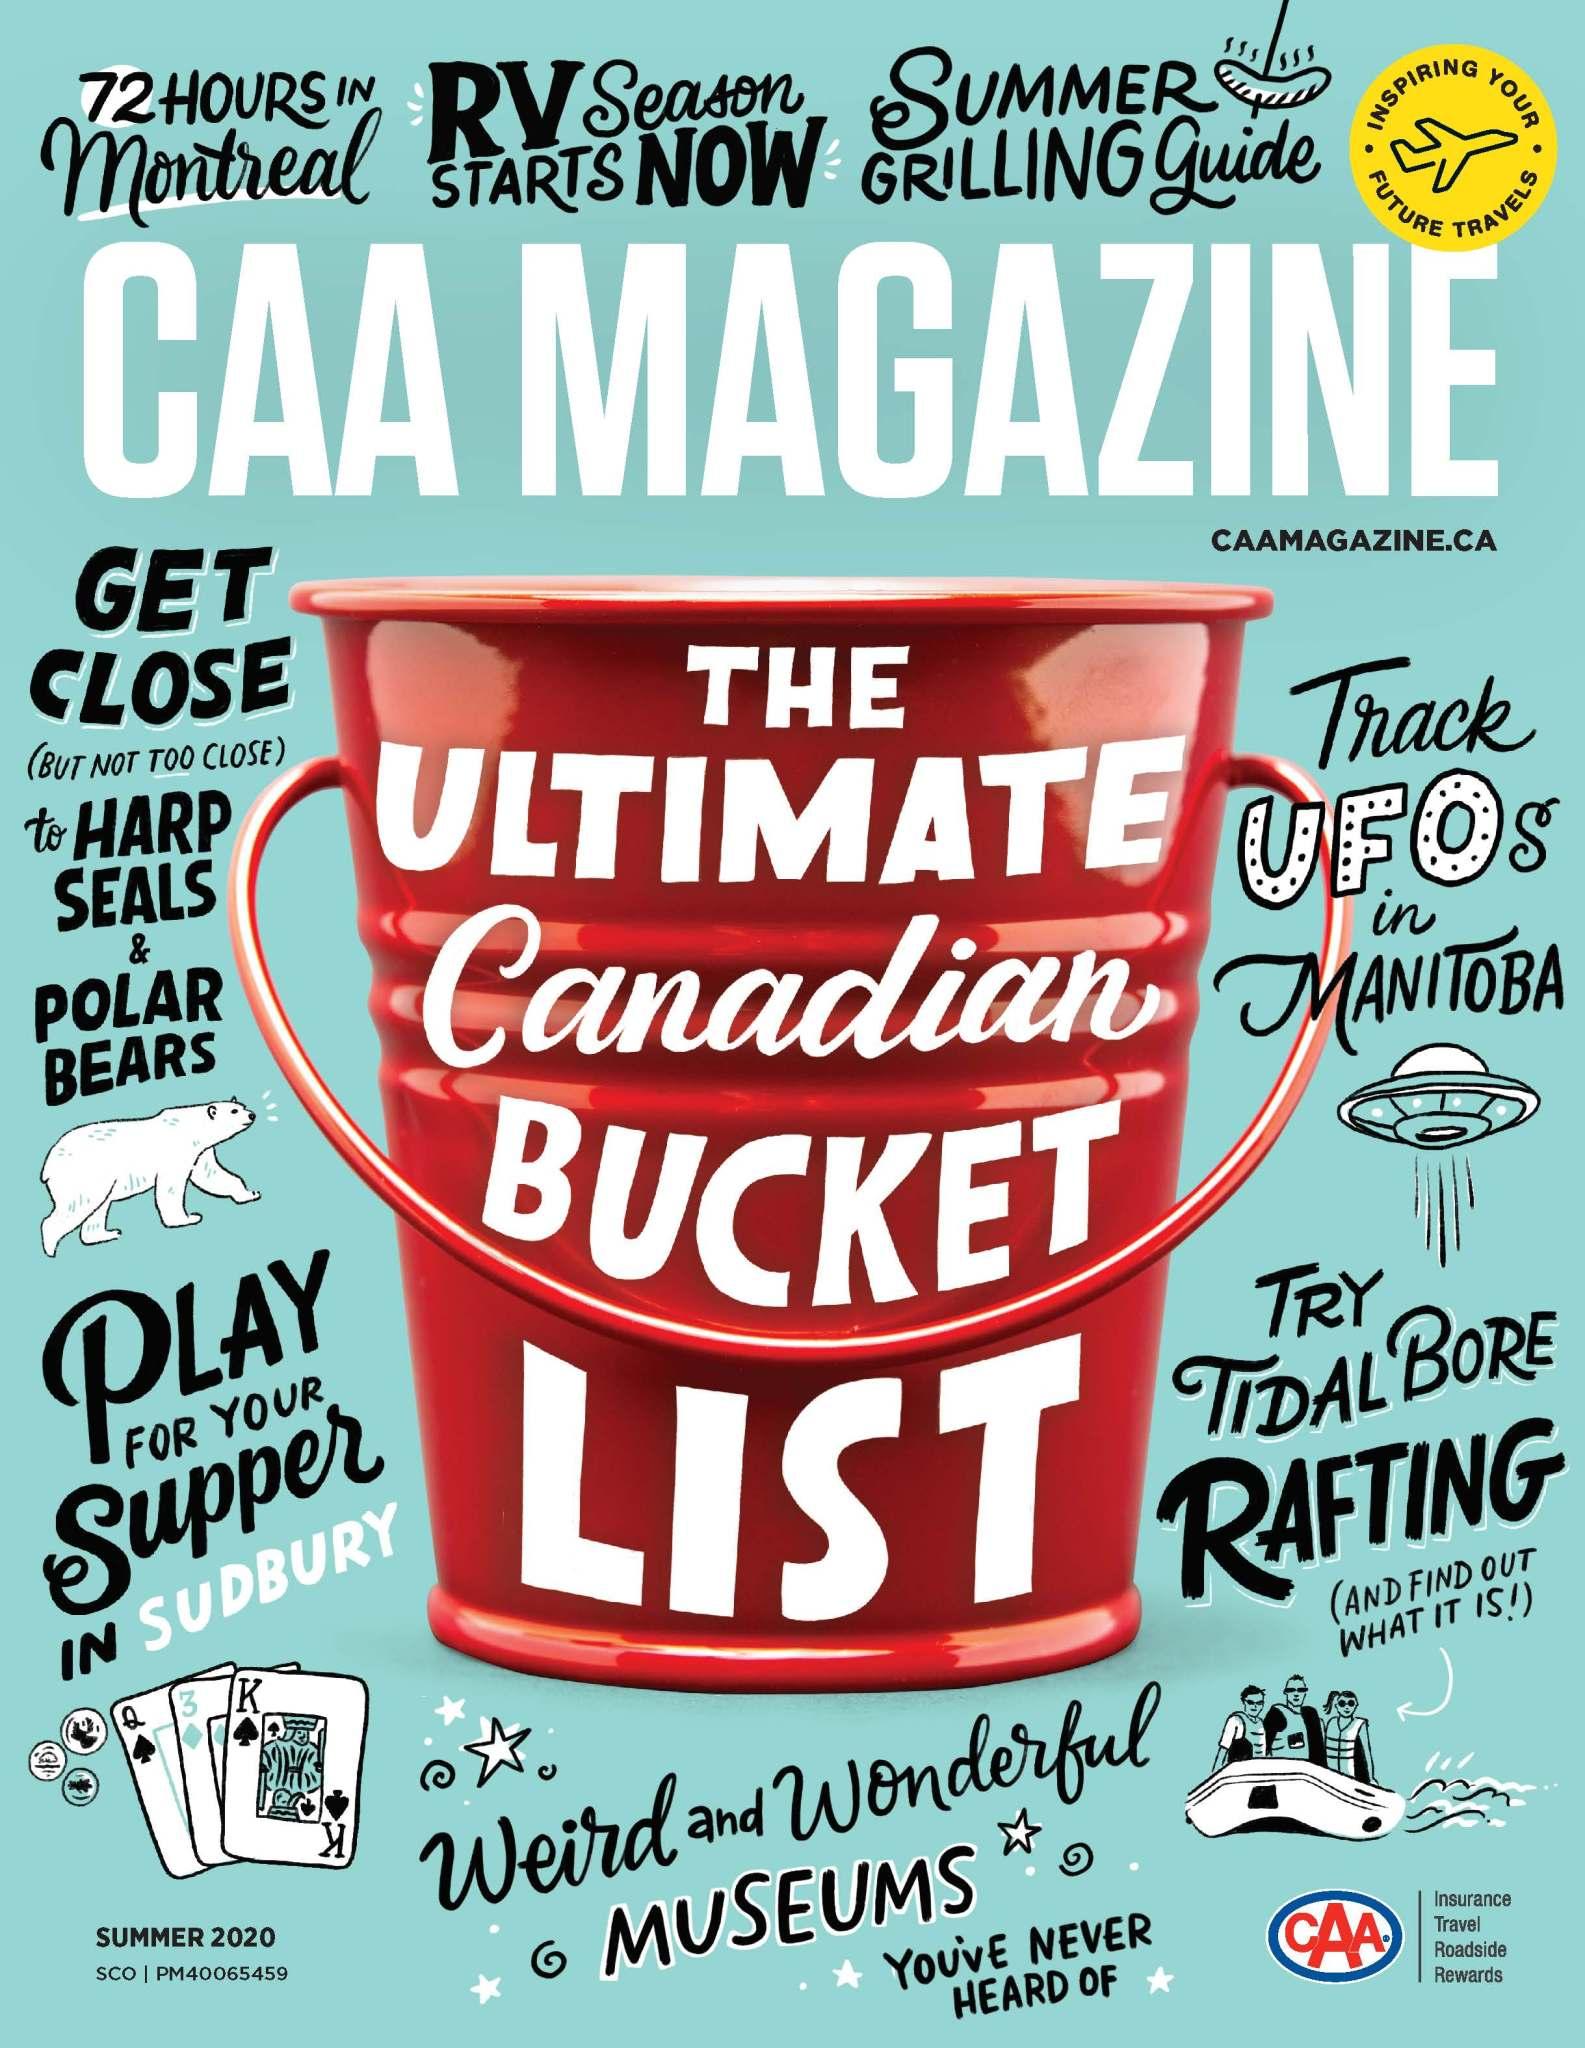 CAA Magazine Best Cover